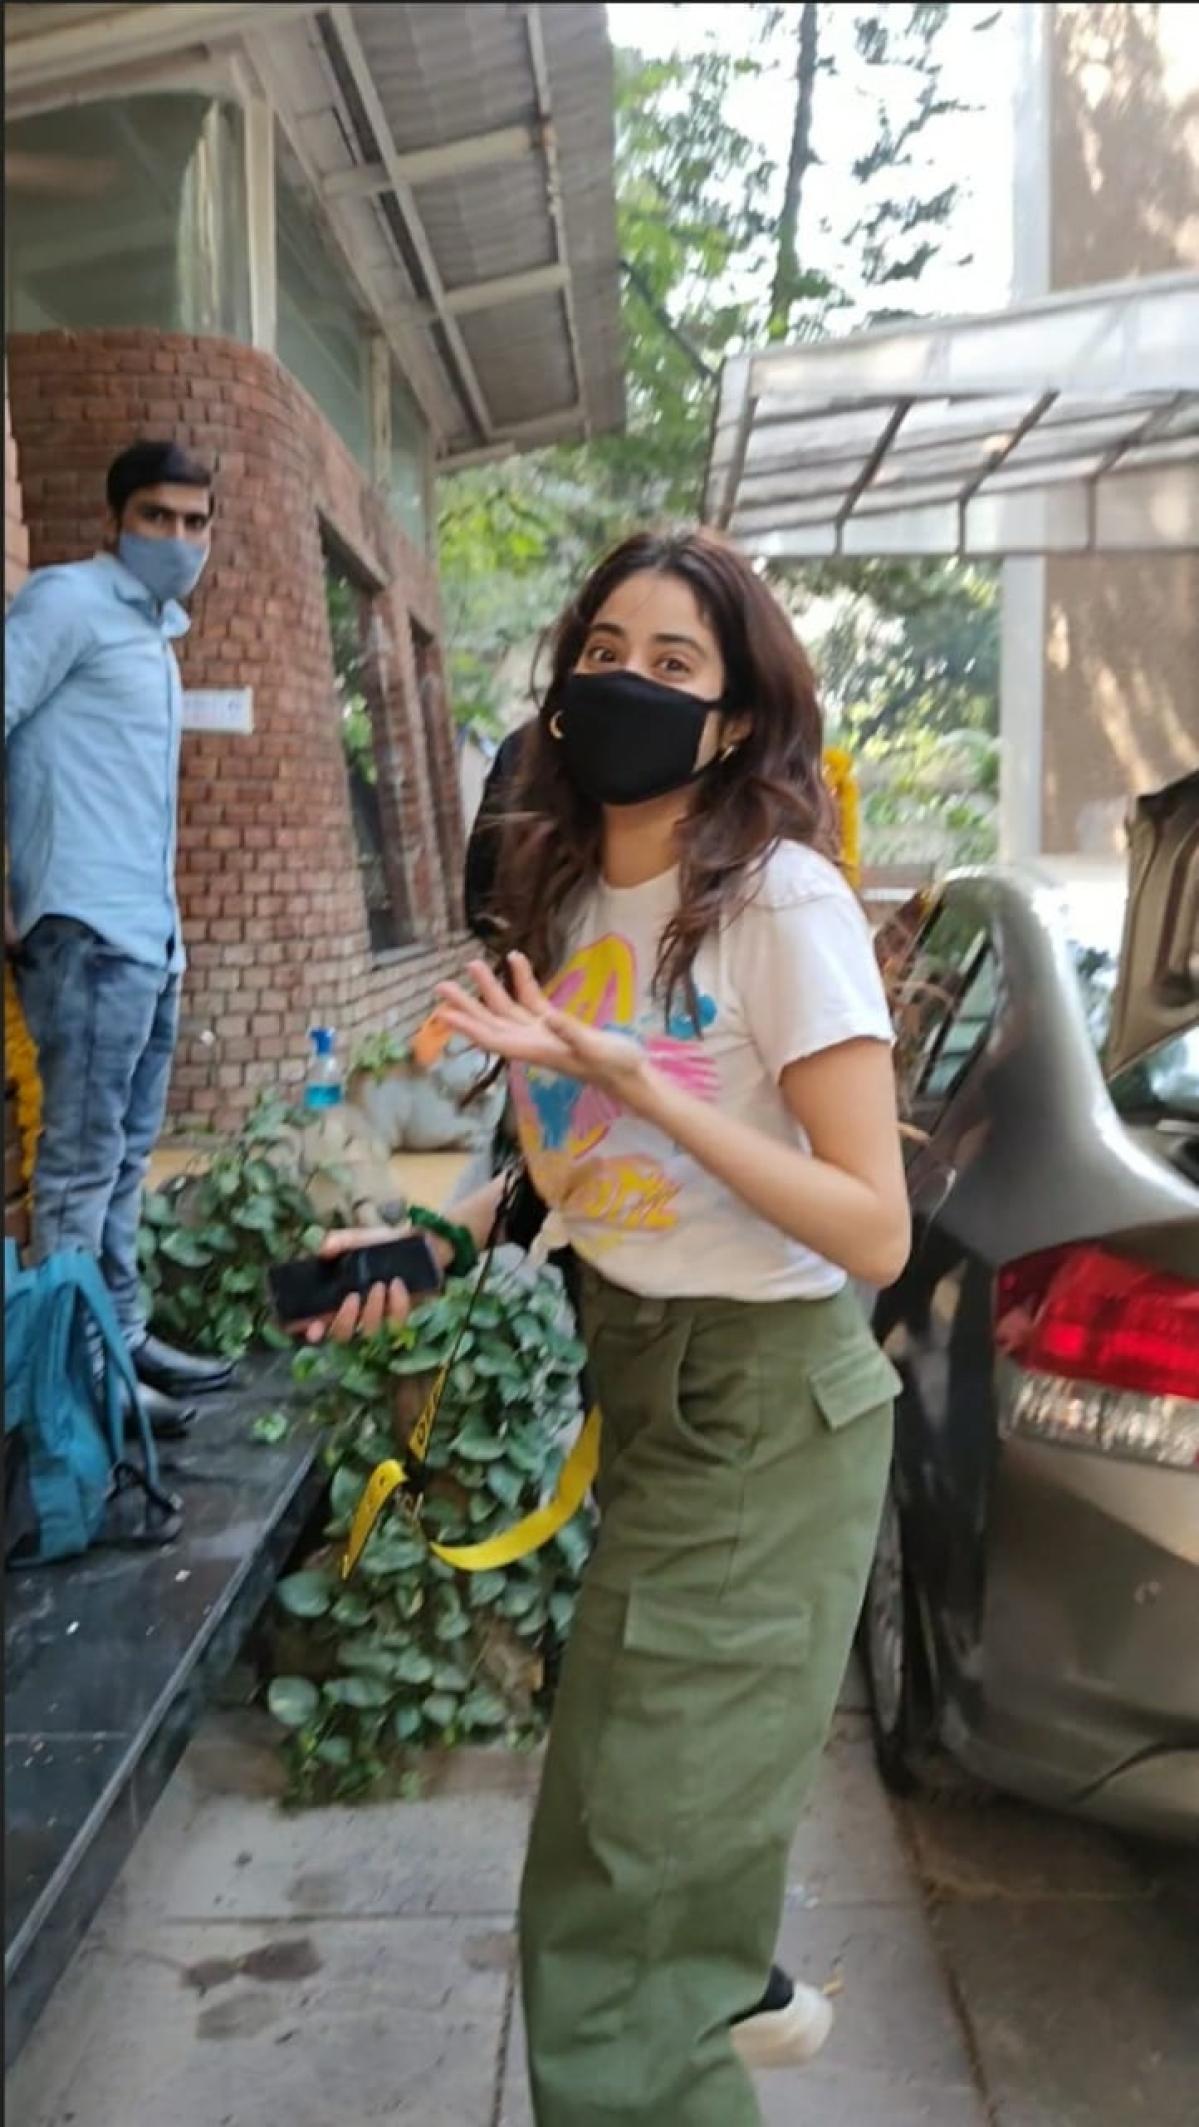 In Pics: Janhvi Kapoor, Ali Fazal, Richa Chaddha, Alaya F and other Bollywood celebs spotted in Mumbai